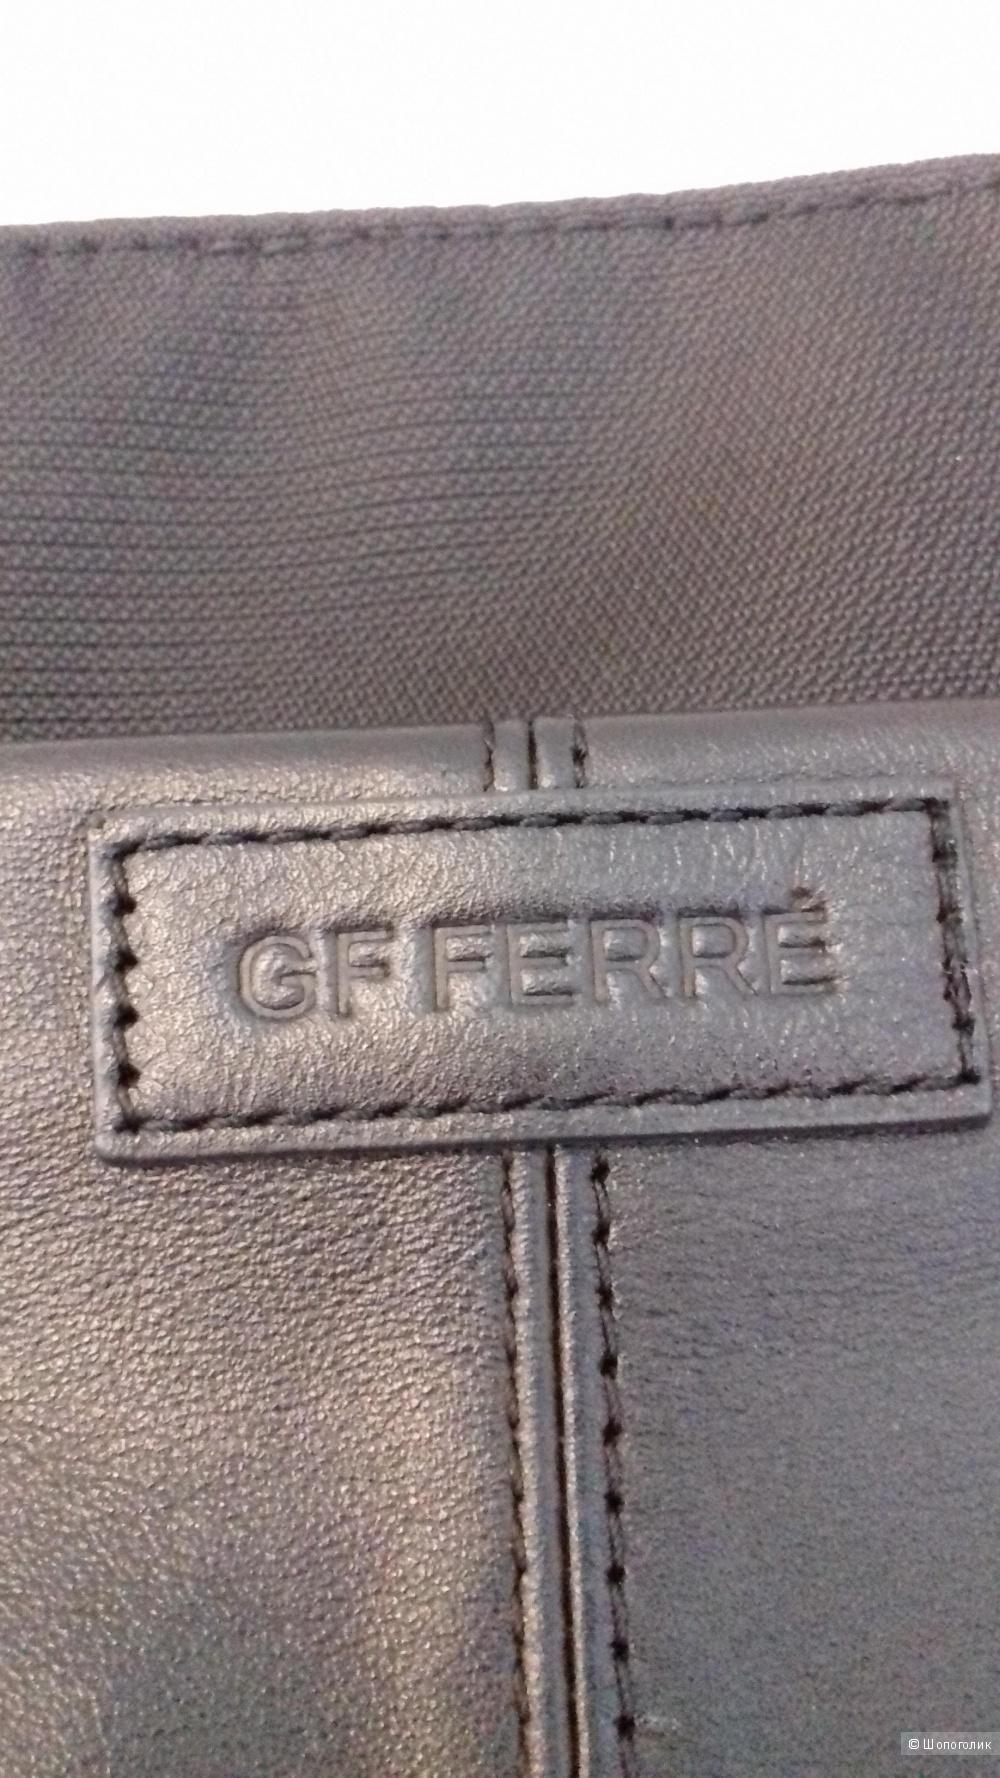 Сумка кросс - боди - планшет GF Ferre, 100% оригинал, Италия